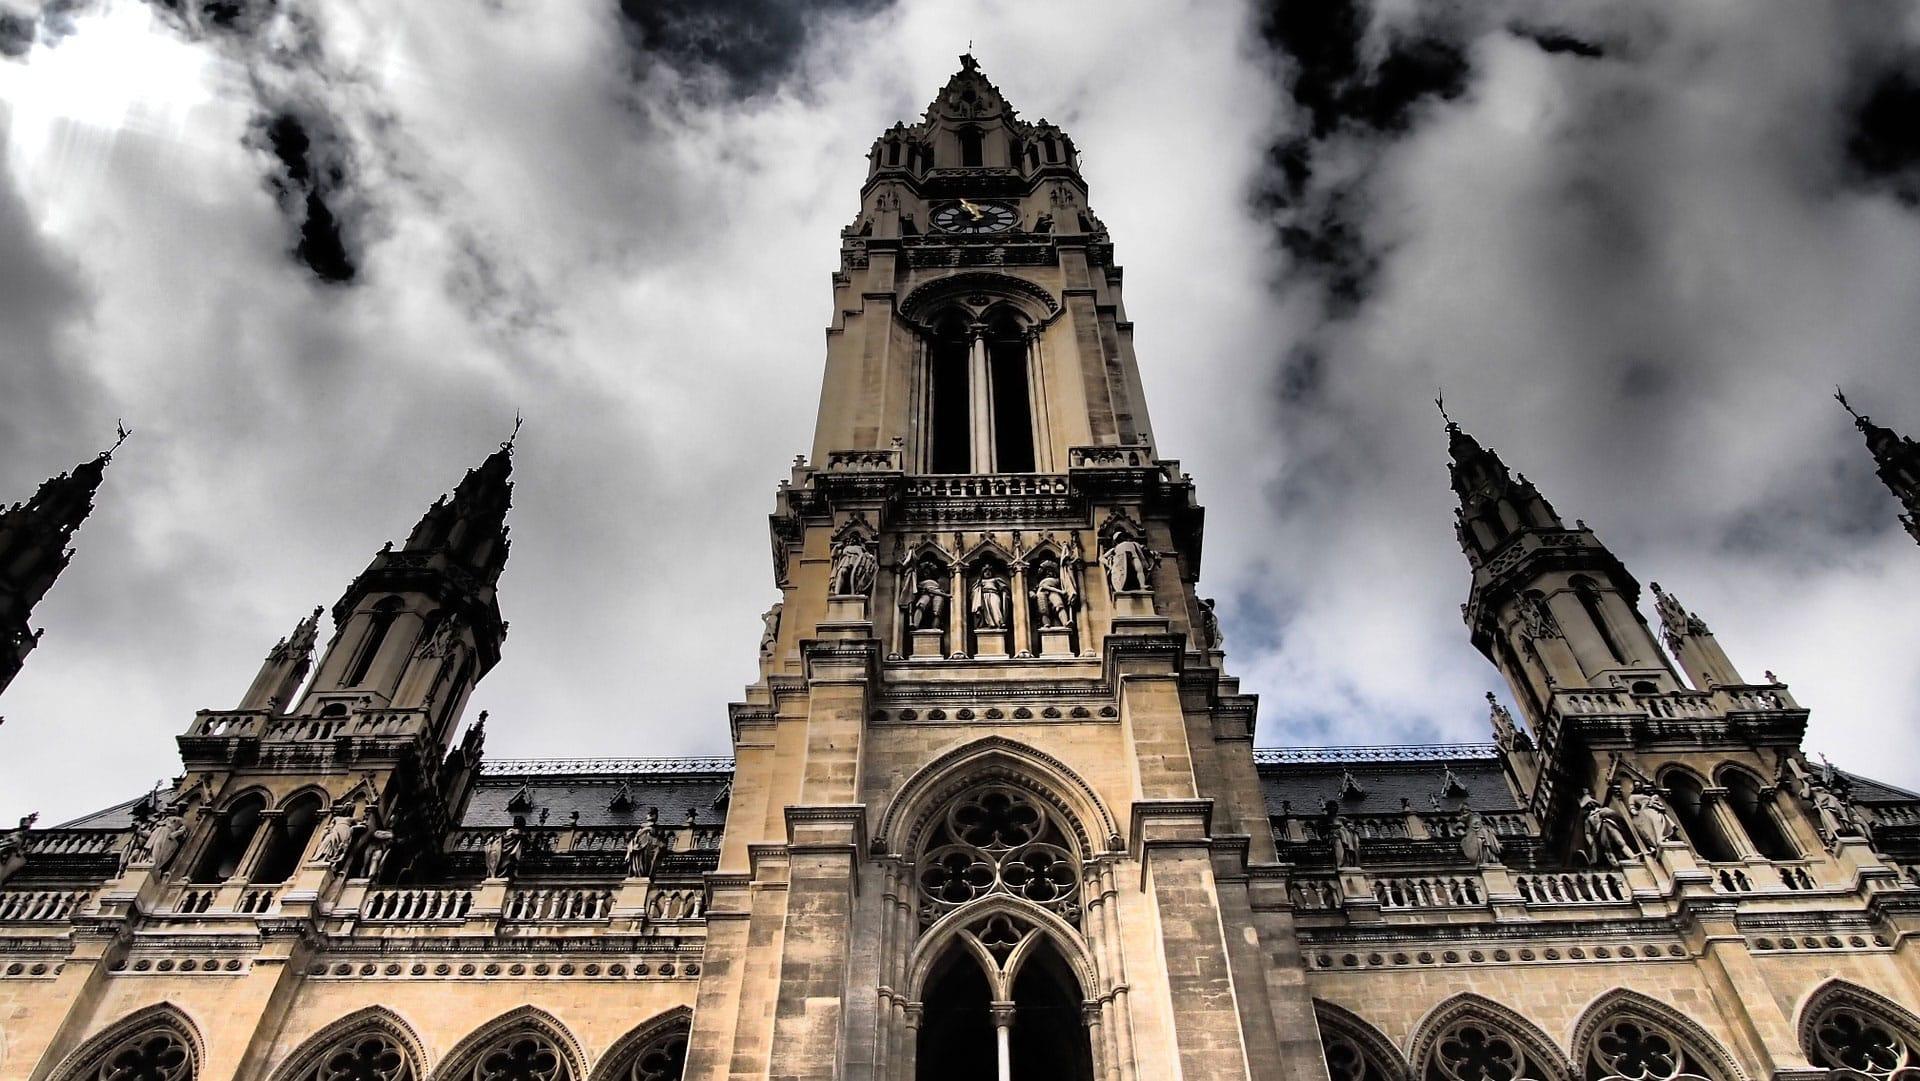 Vienna (image by pixabay.com)